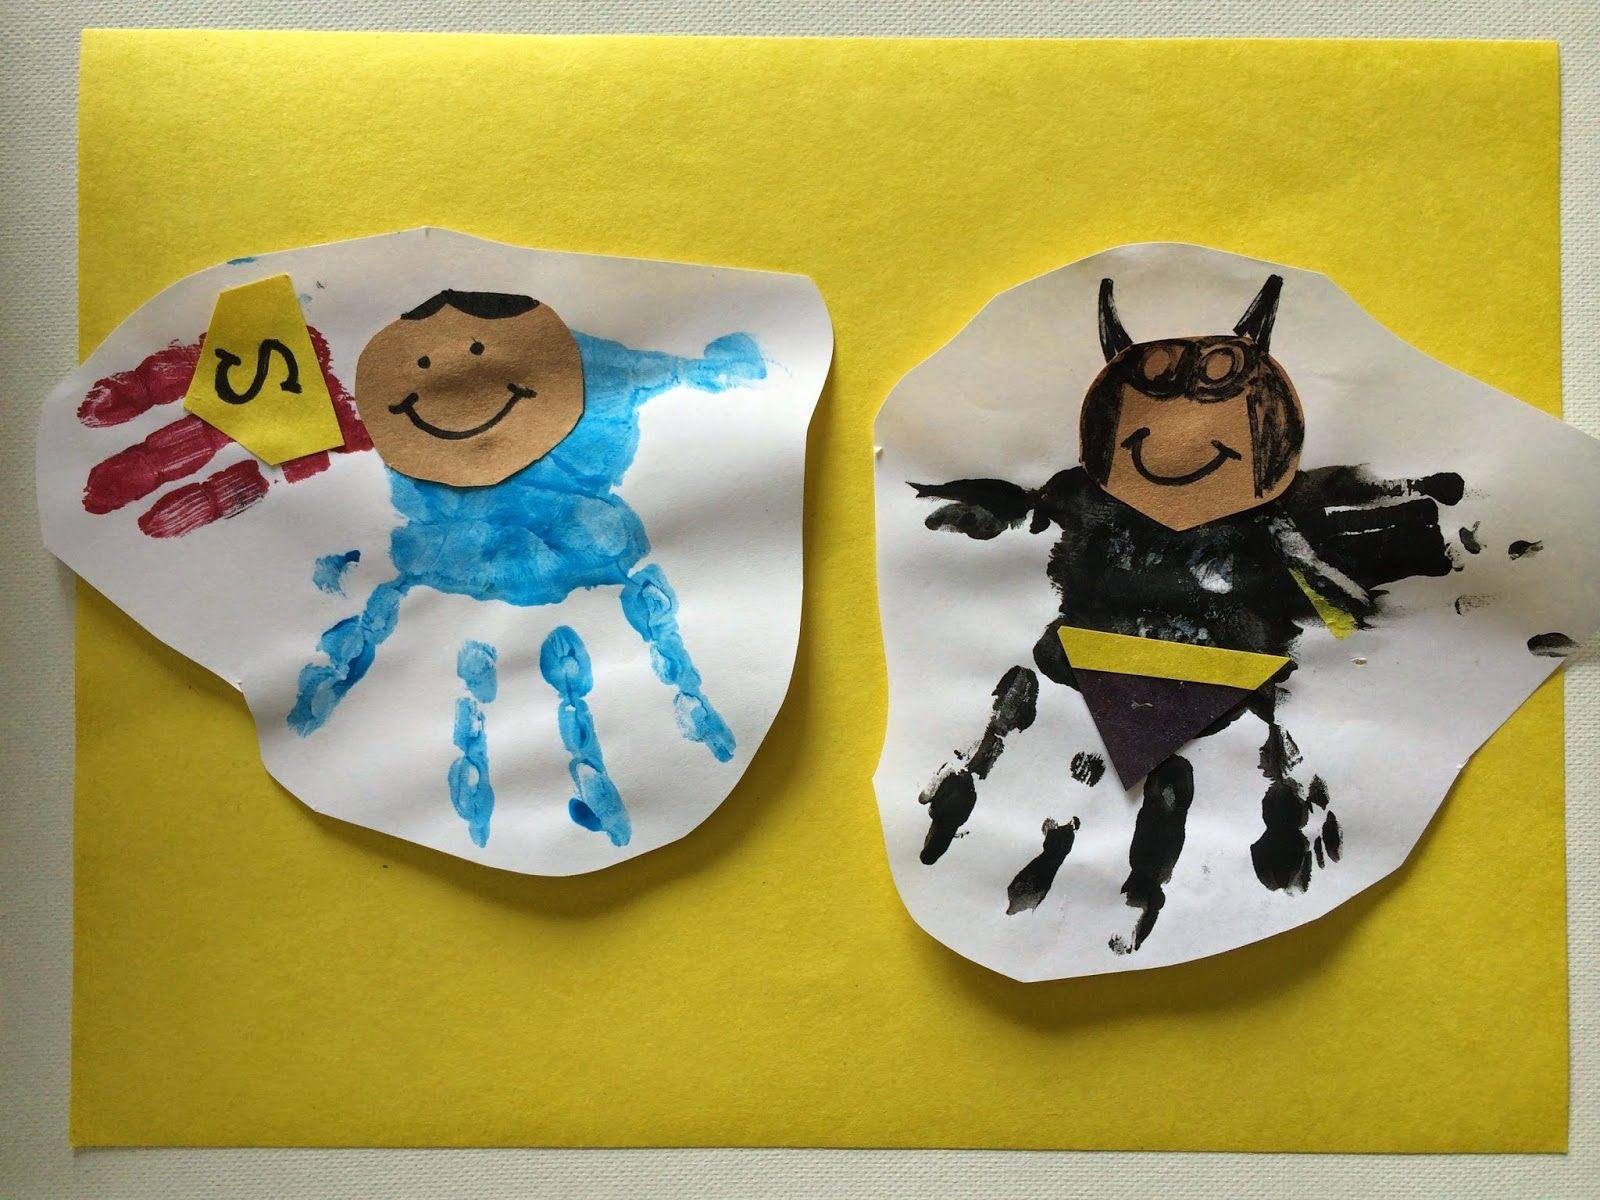 5 Superhero Crafts for Kids - The Chirping Moms #superherocrafts